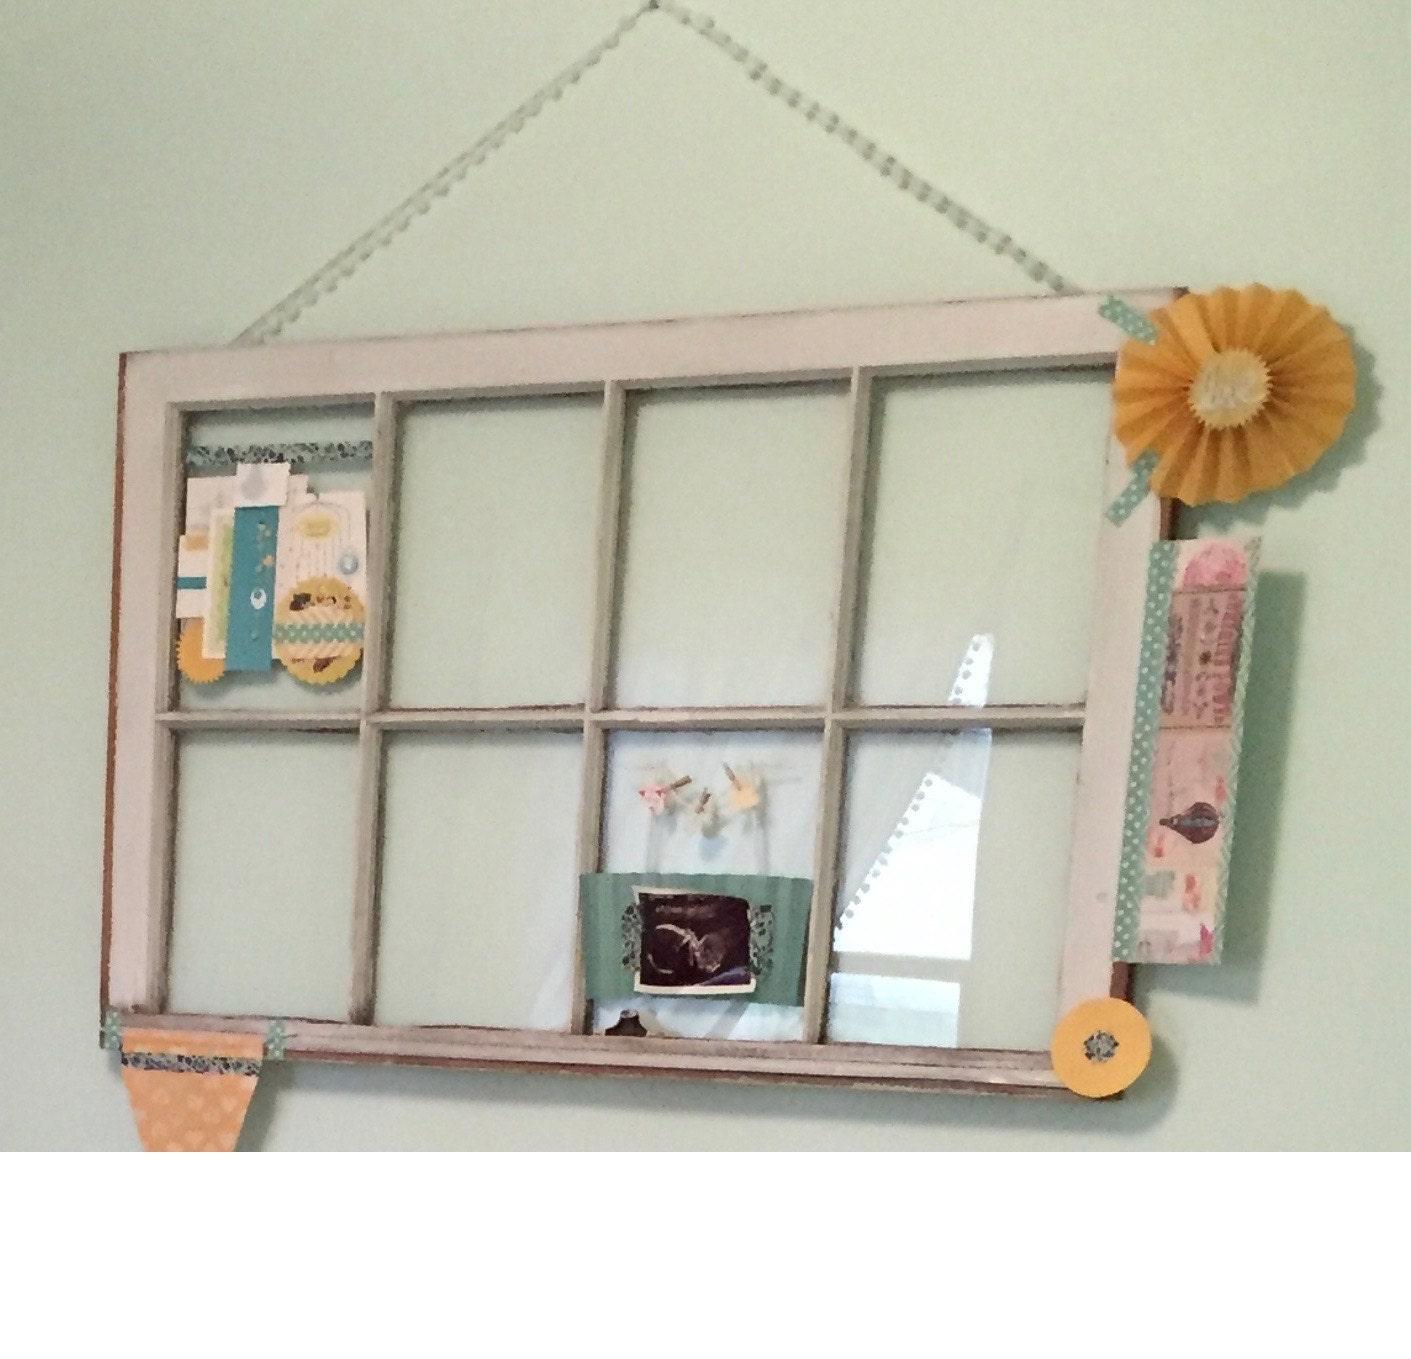 SALE Window Pane / Frame / Vintage / Old / Home Decor / Rustic / Bohemian / Nursery / Wall Art / Wedding / Eco / Salvaged / Upcycled